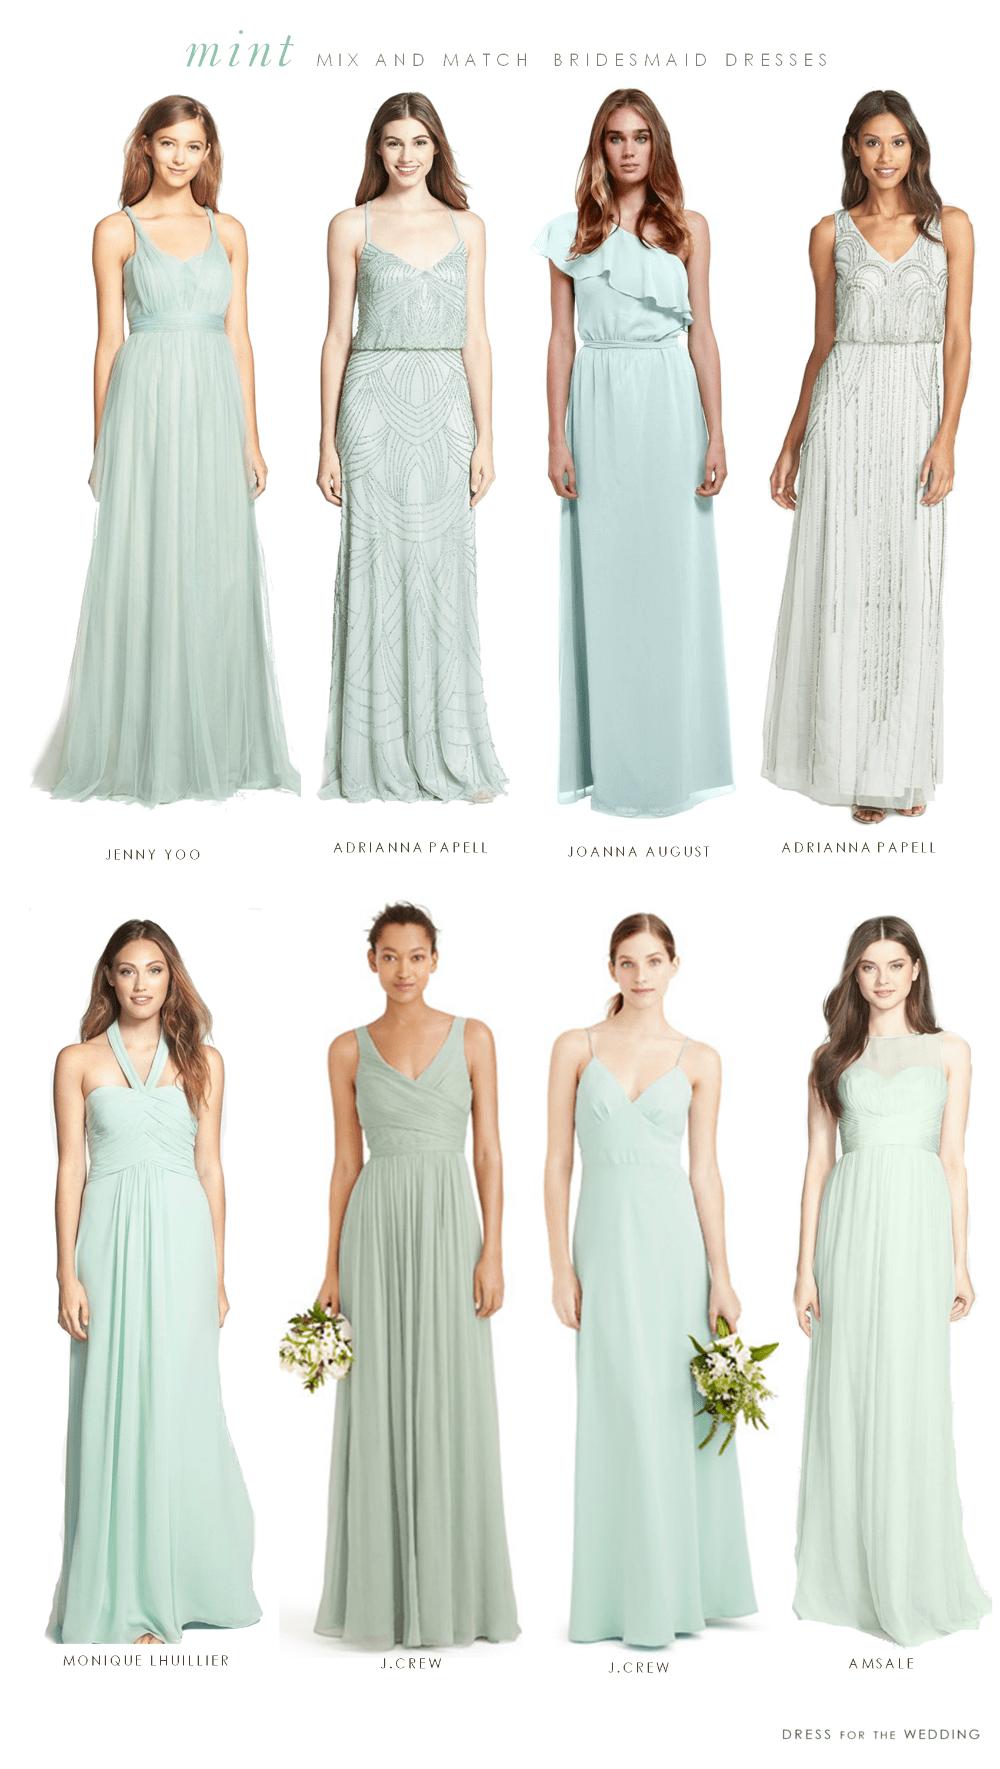 Mint mismatched bridesmaid dresses for Mint bridesmaid dresses wedding